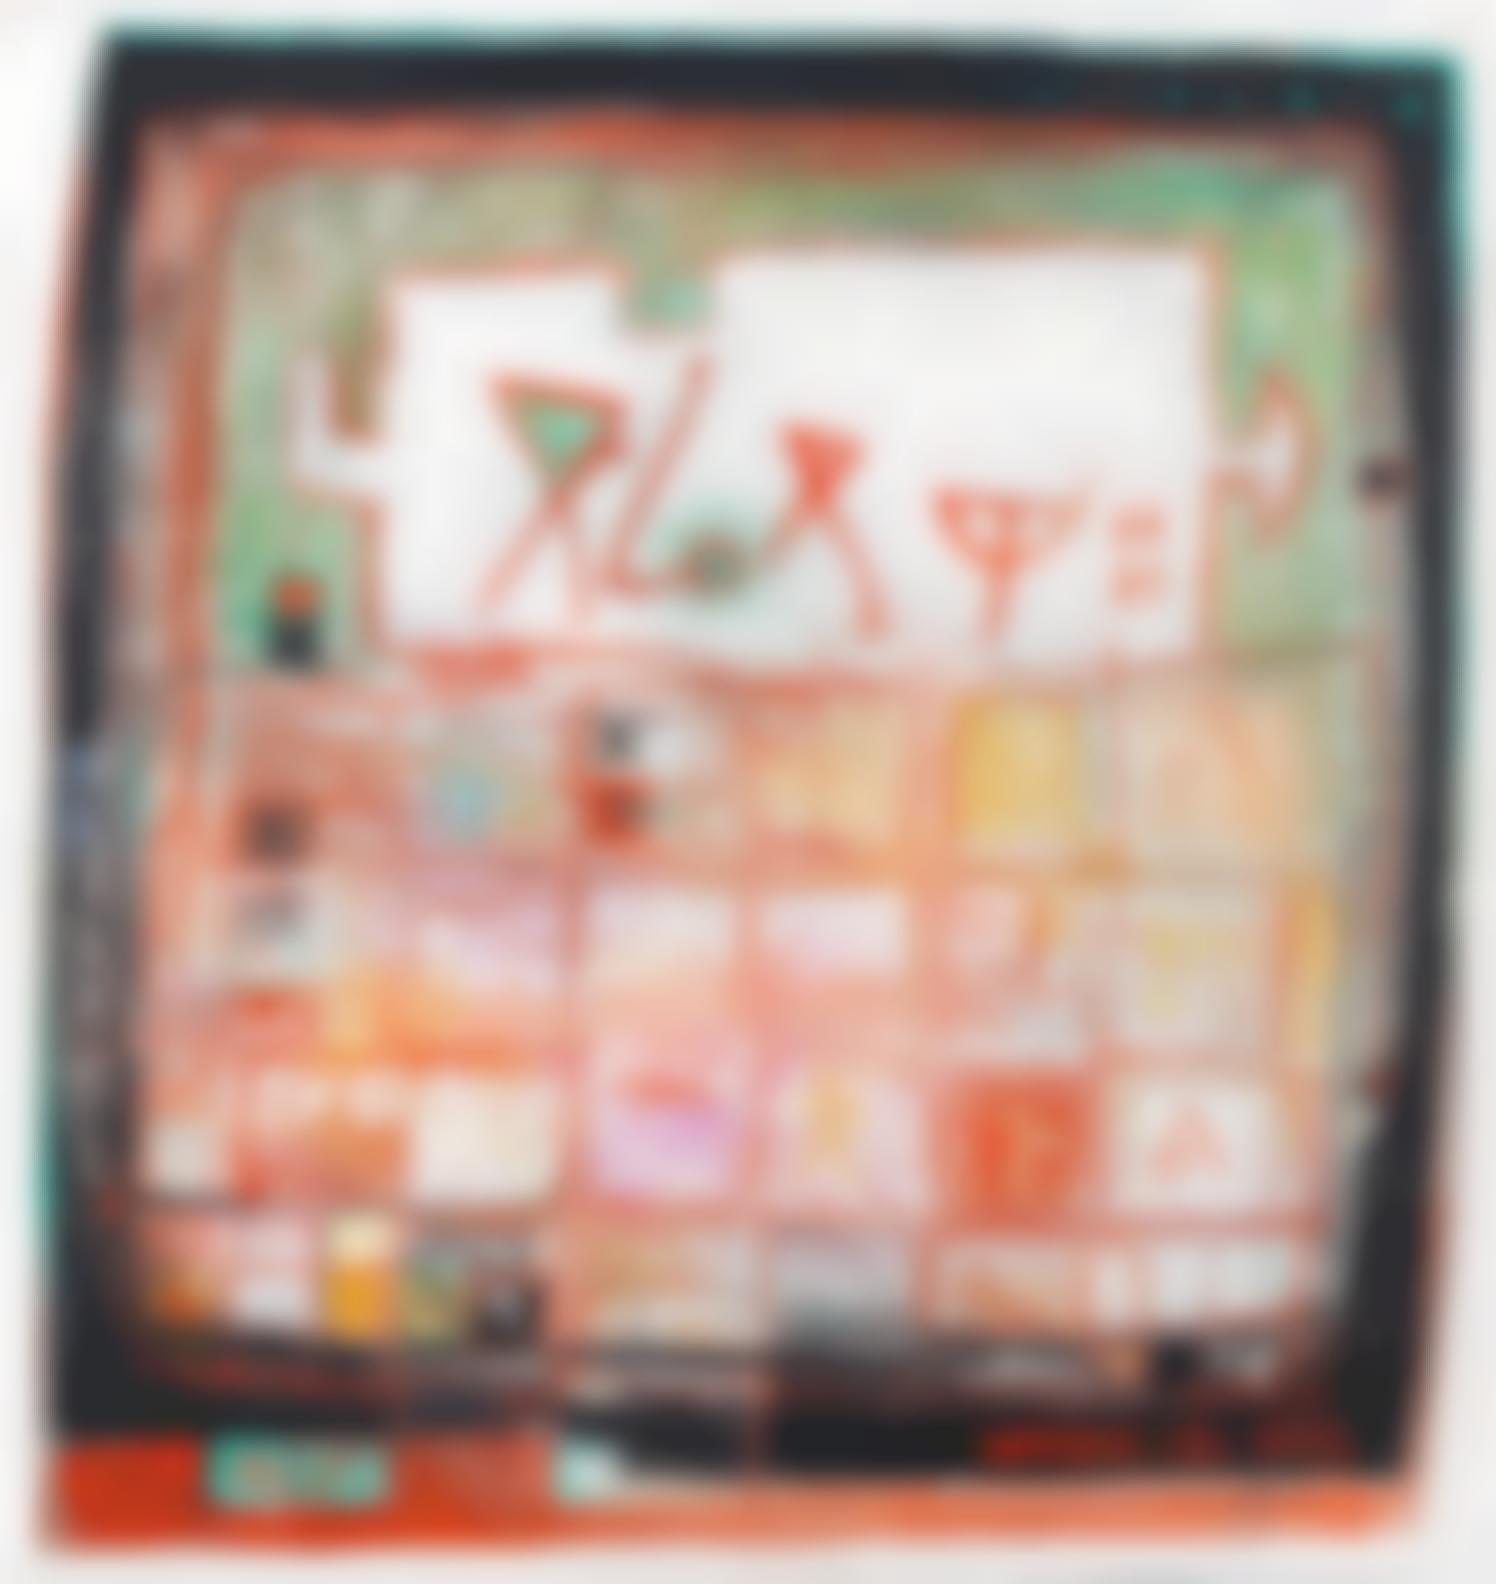 Wosene Worke Kosrof - Three Works: Dire Dawa, Lalibela, Untitled-1987